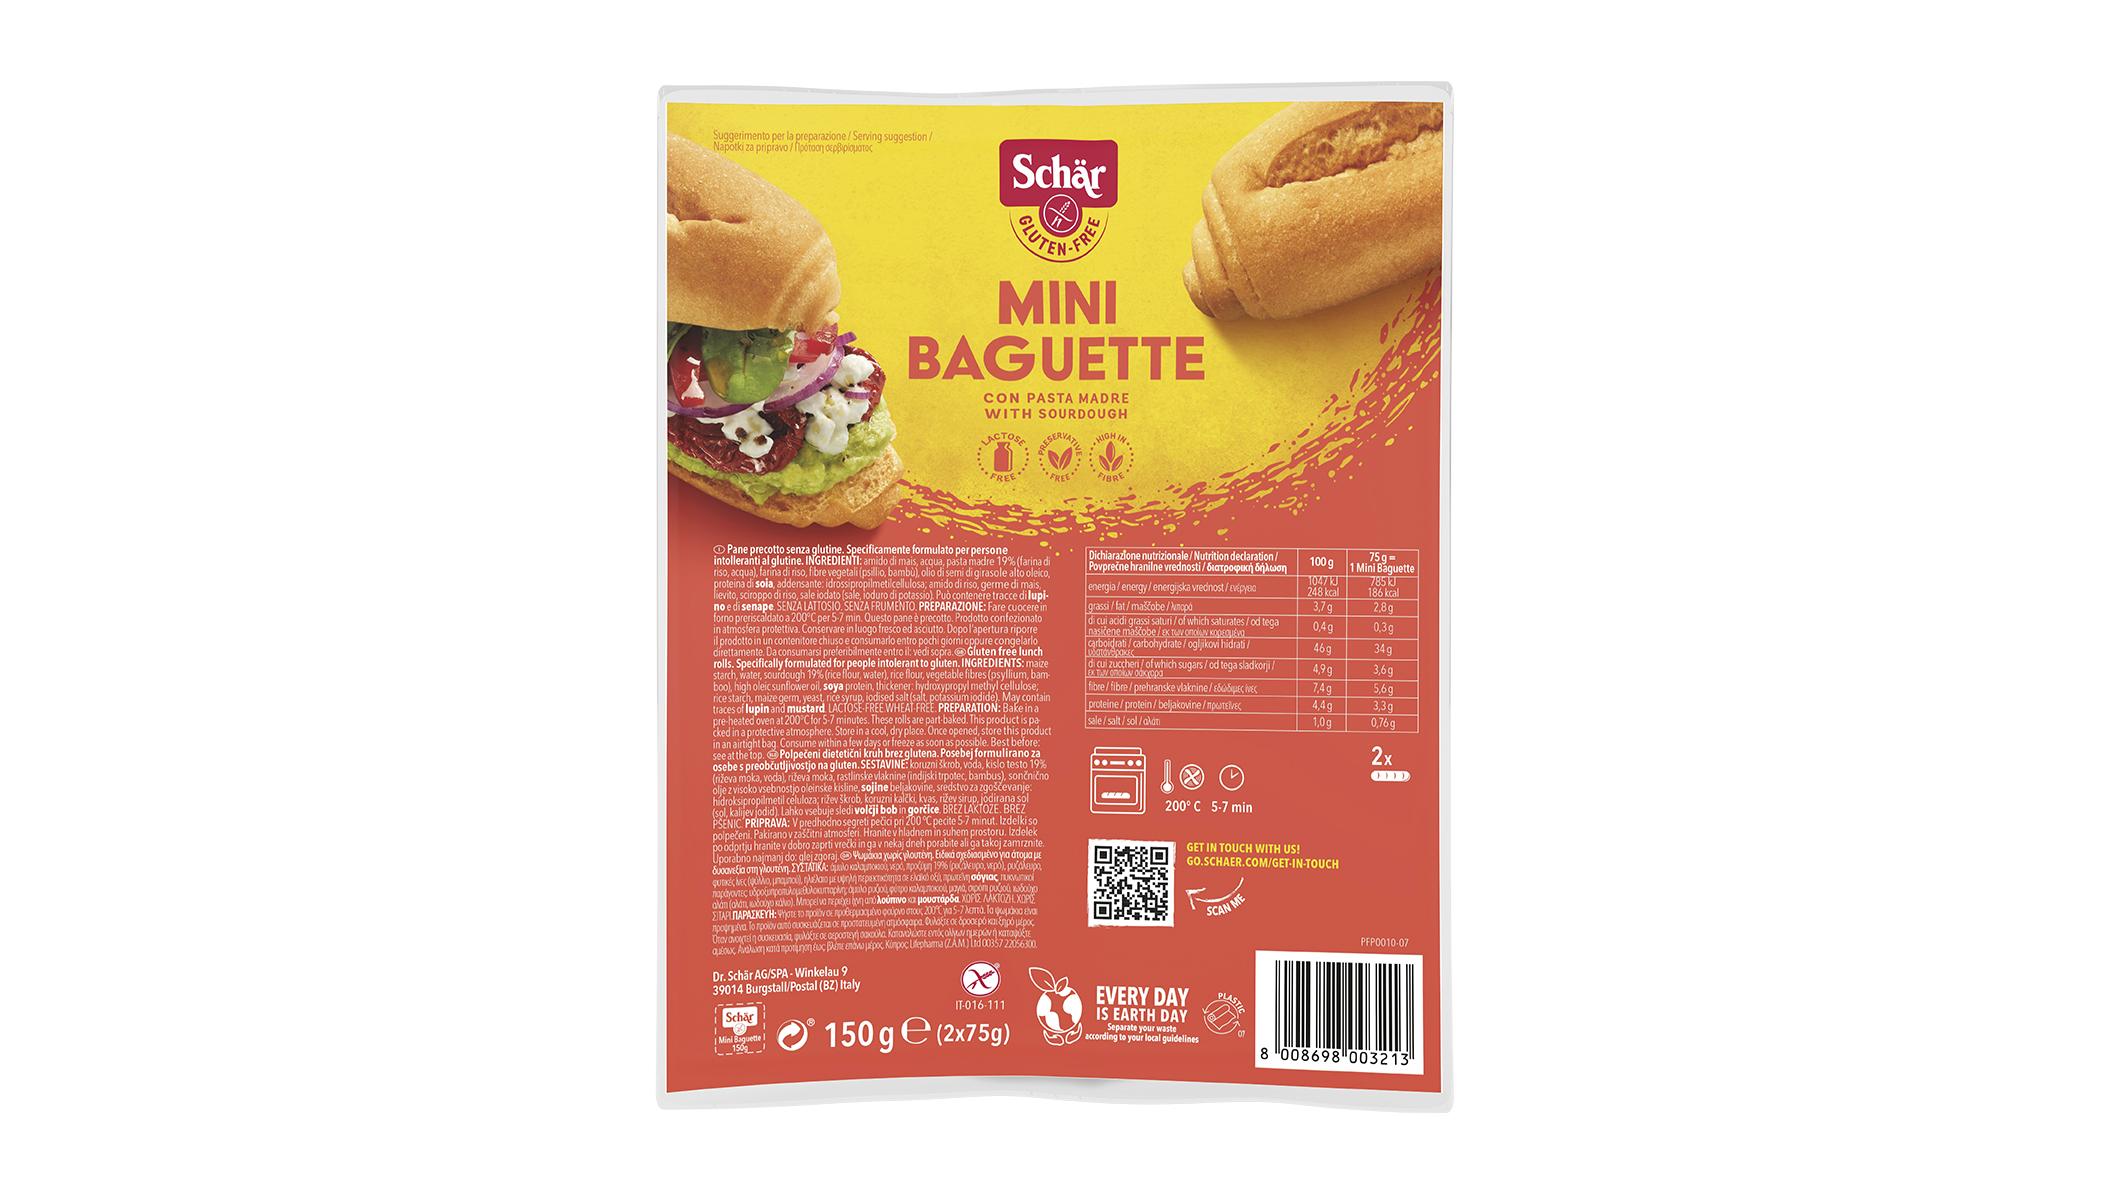 Mini Baguette - Mini bagett